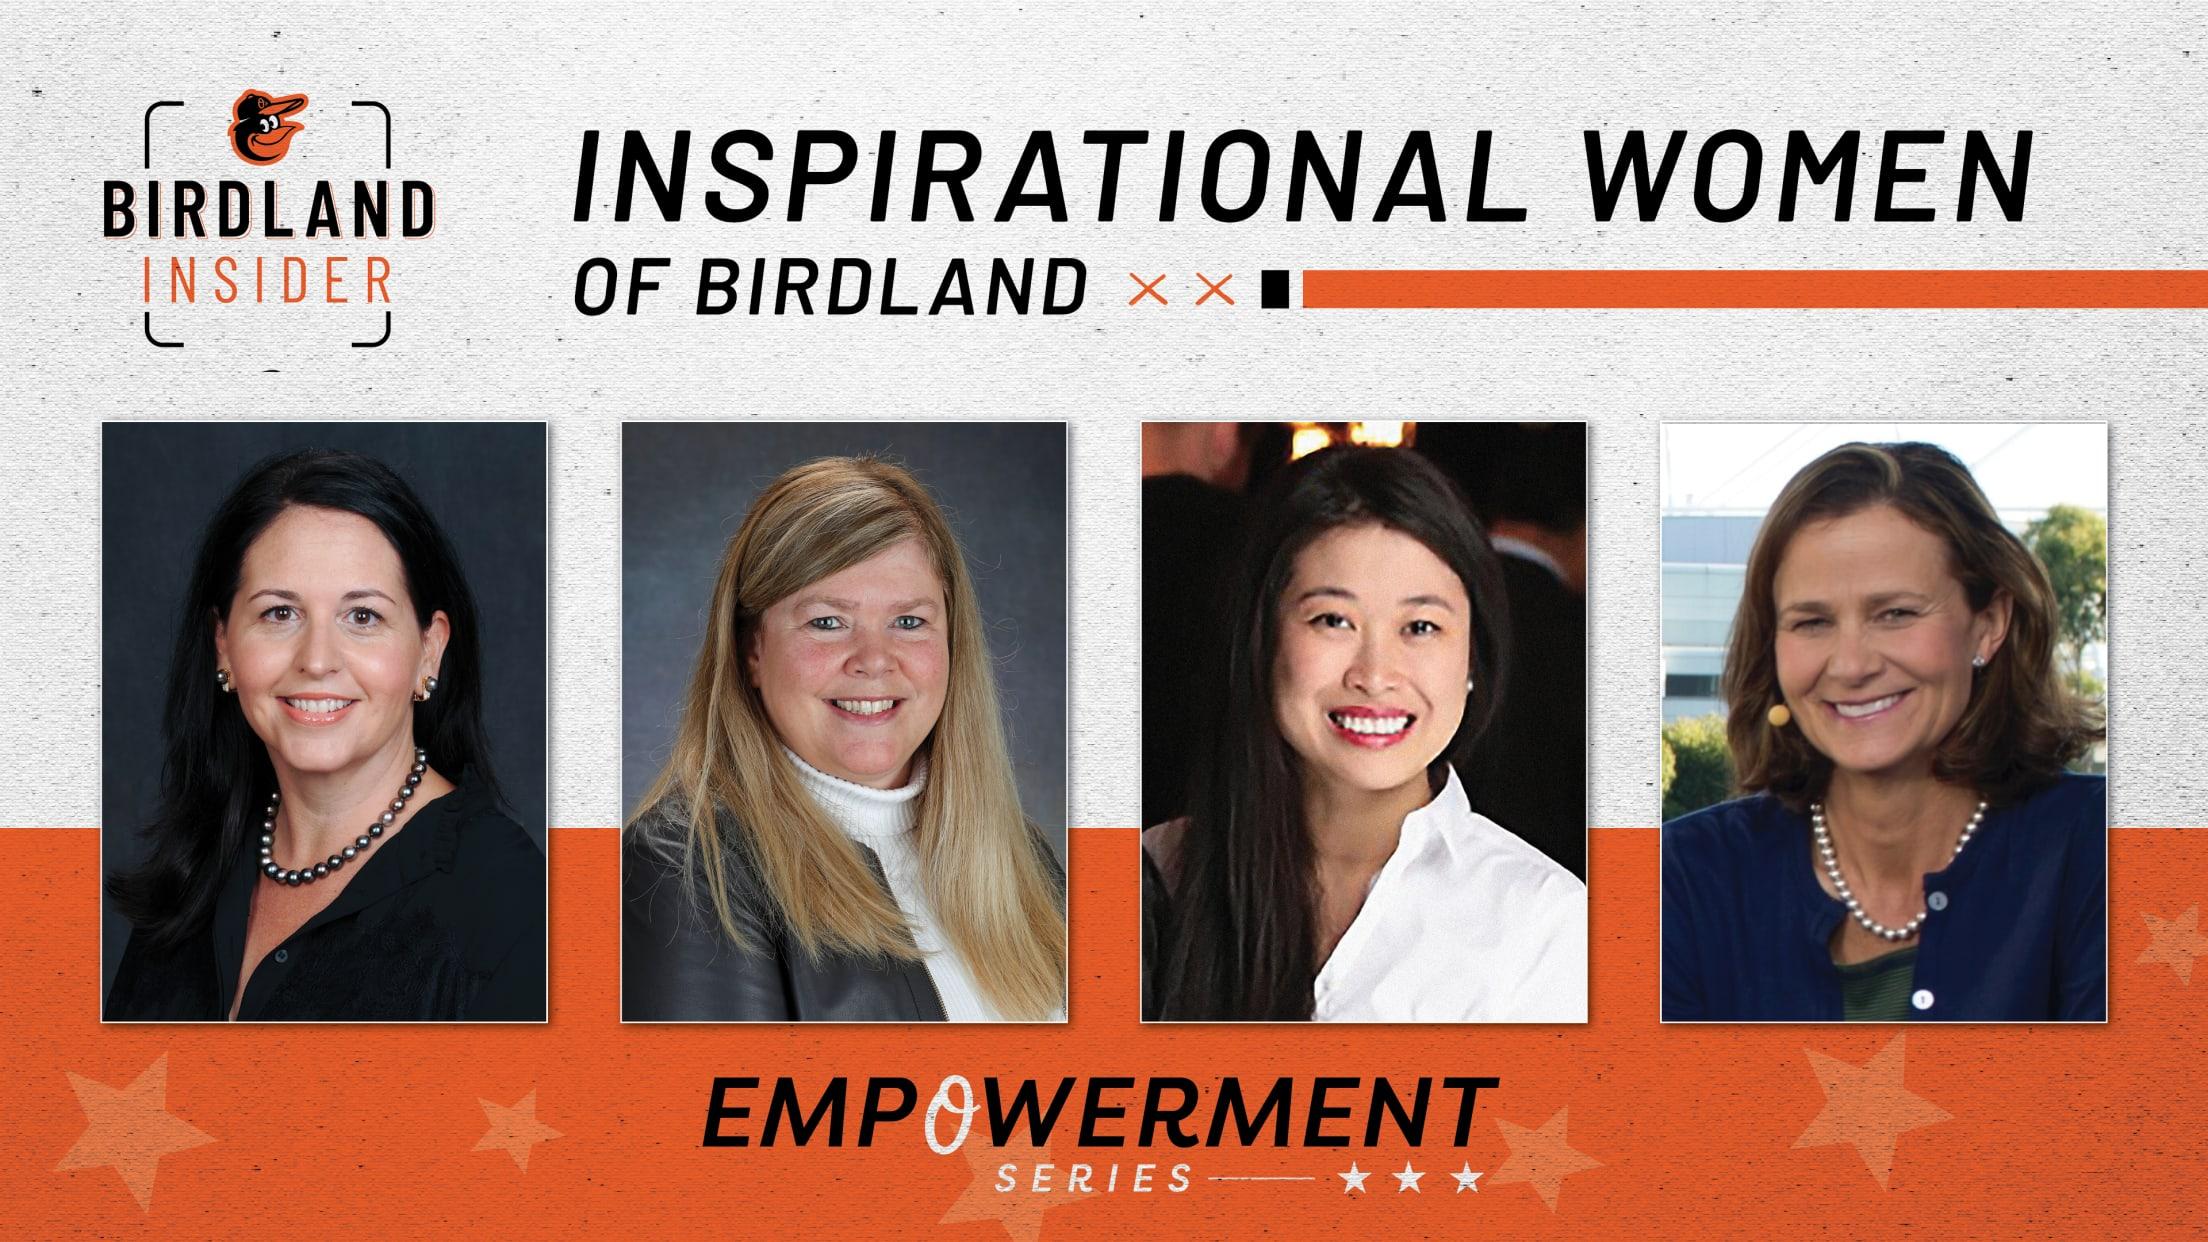 bal-image-header-birdland-insider-inspirational-women